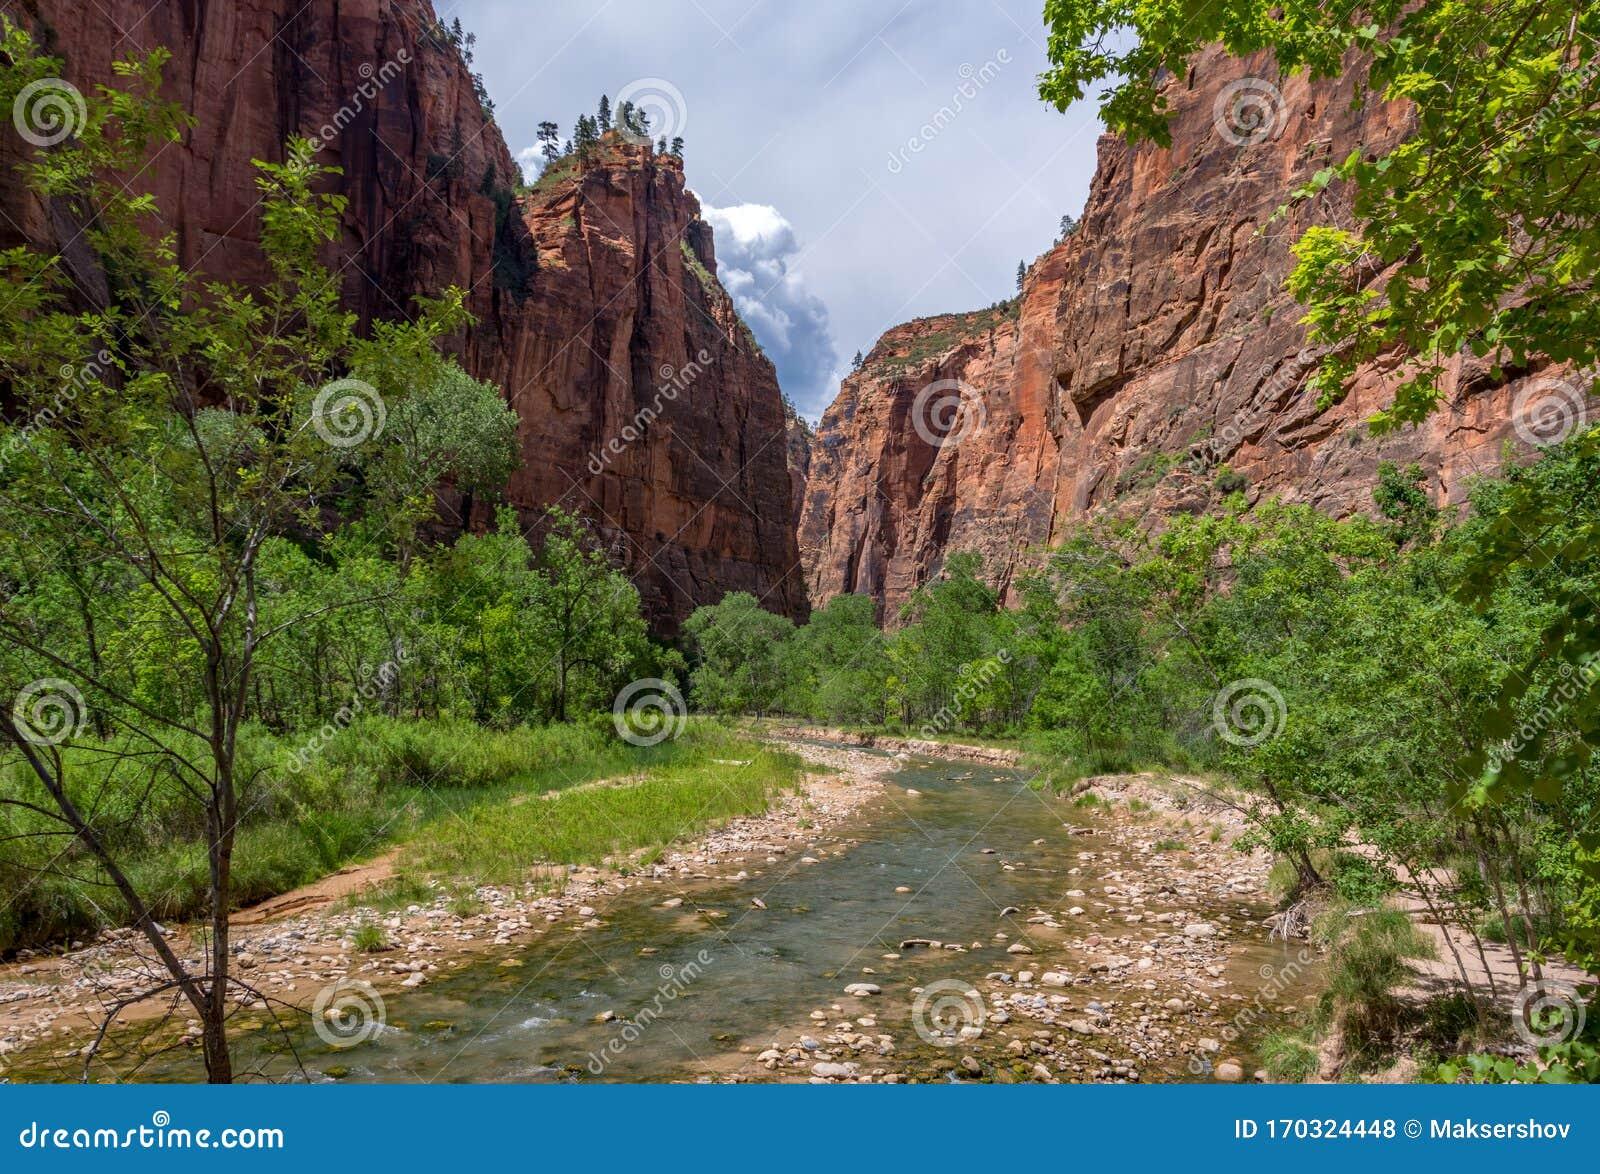 Scenic Drive Through Zion National Park, Utah, USA Stock